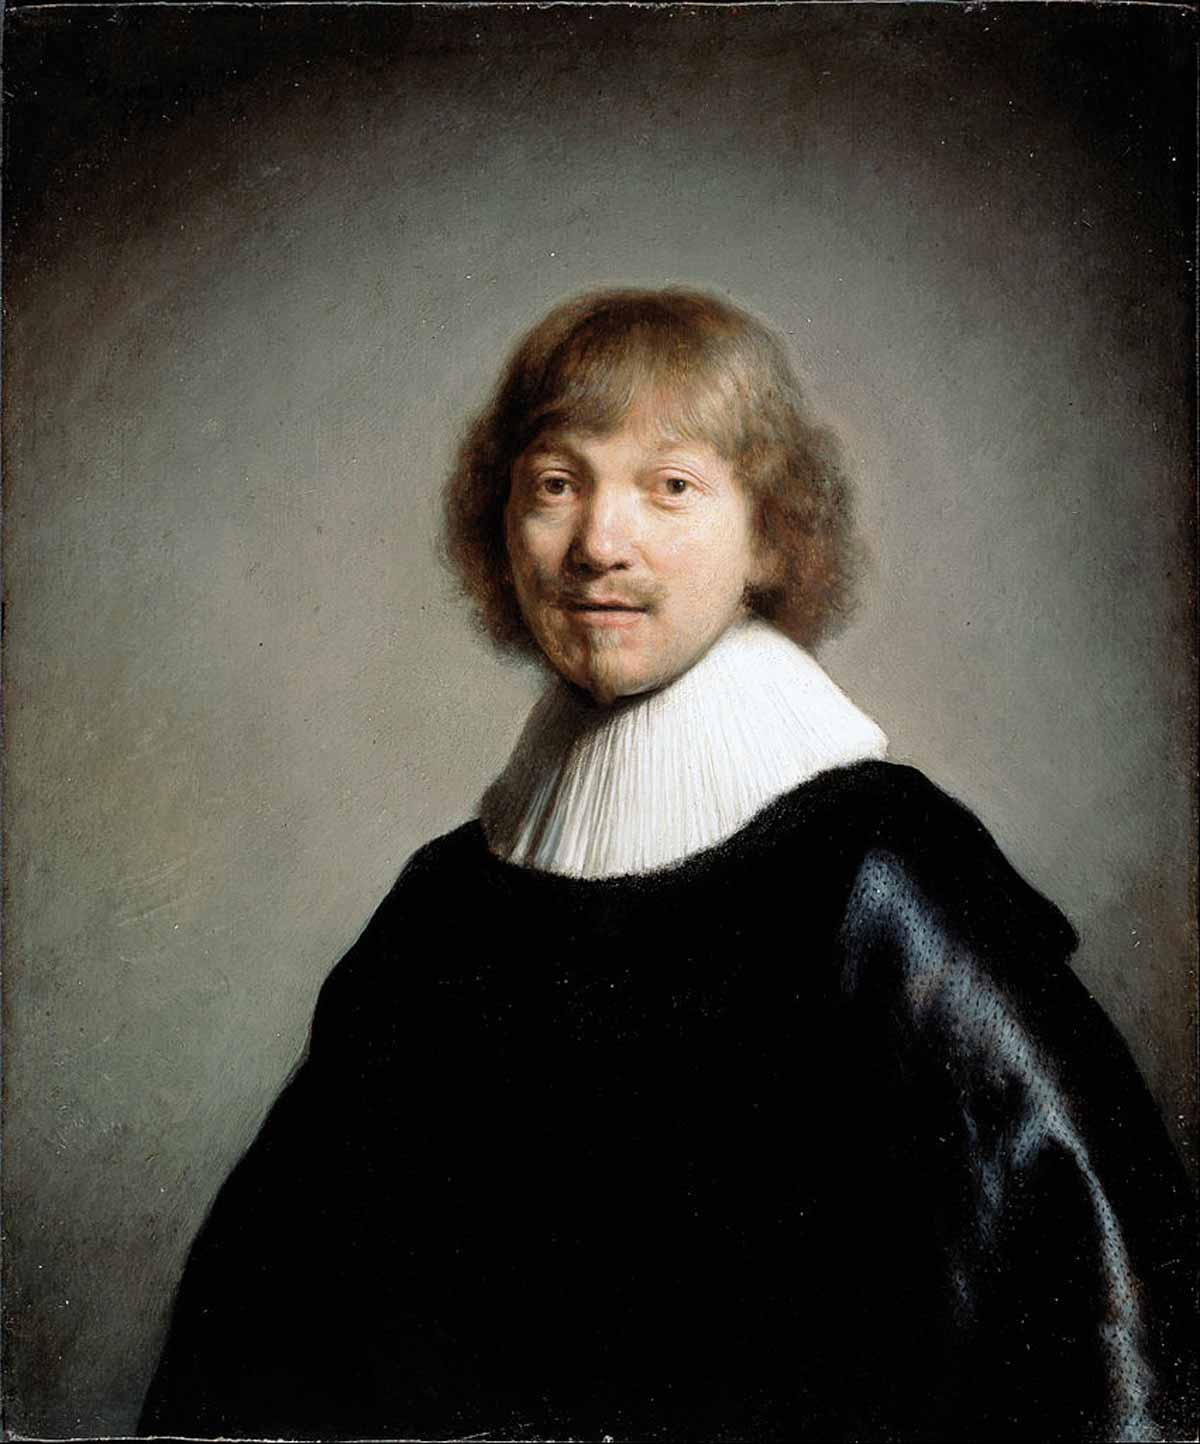 "Rembrandts Gemälde ""Jacob de Gheyn III"" von 1632 wurde 1966 gestohlen."